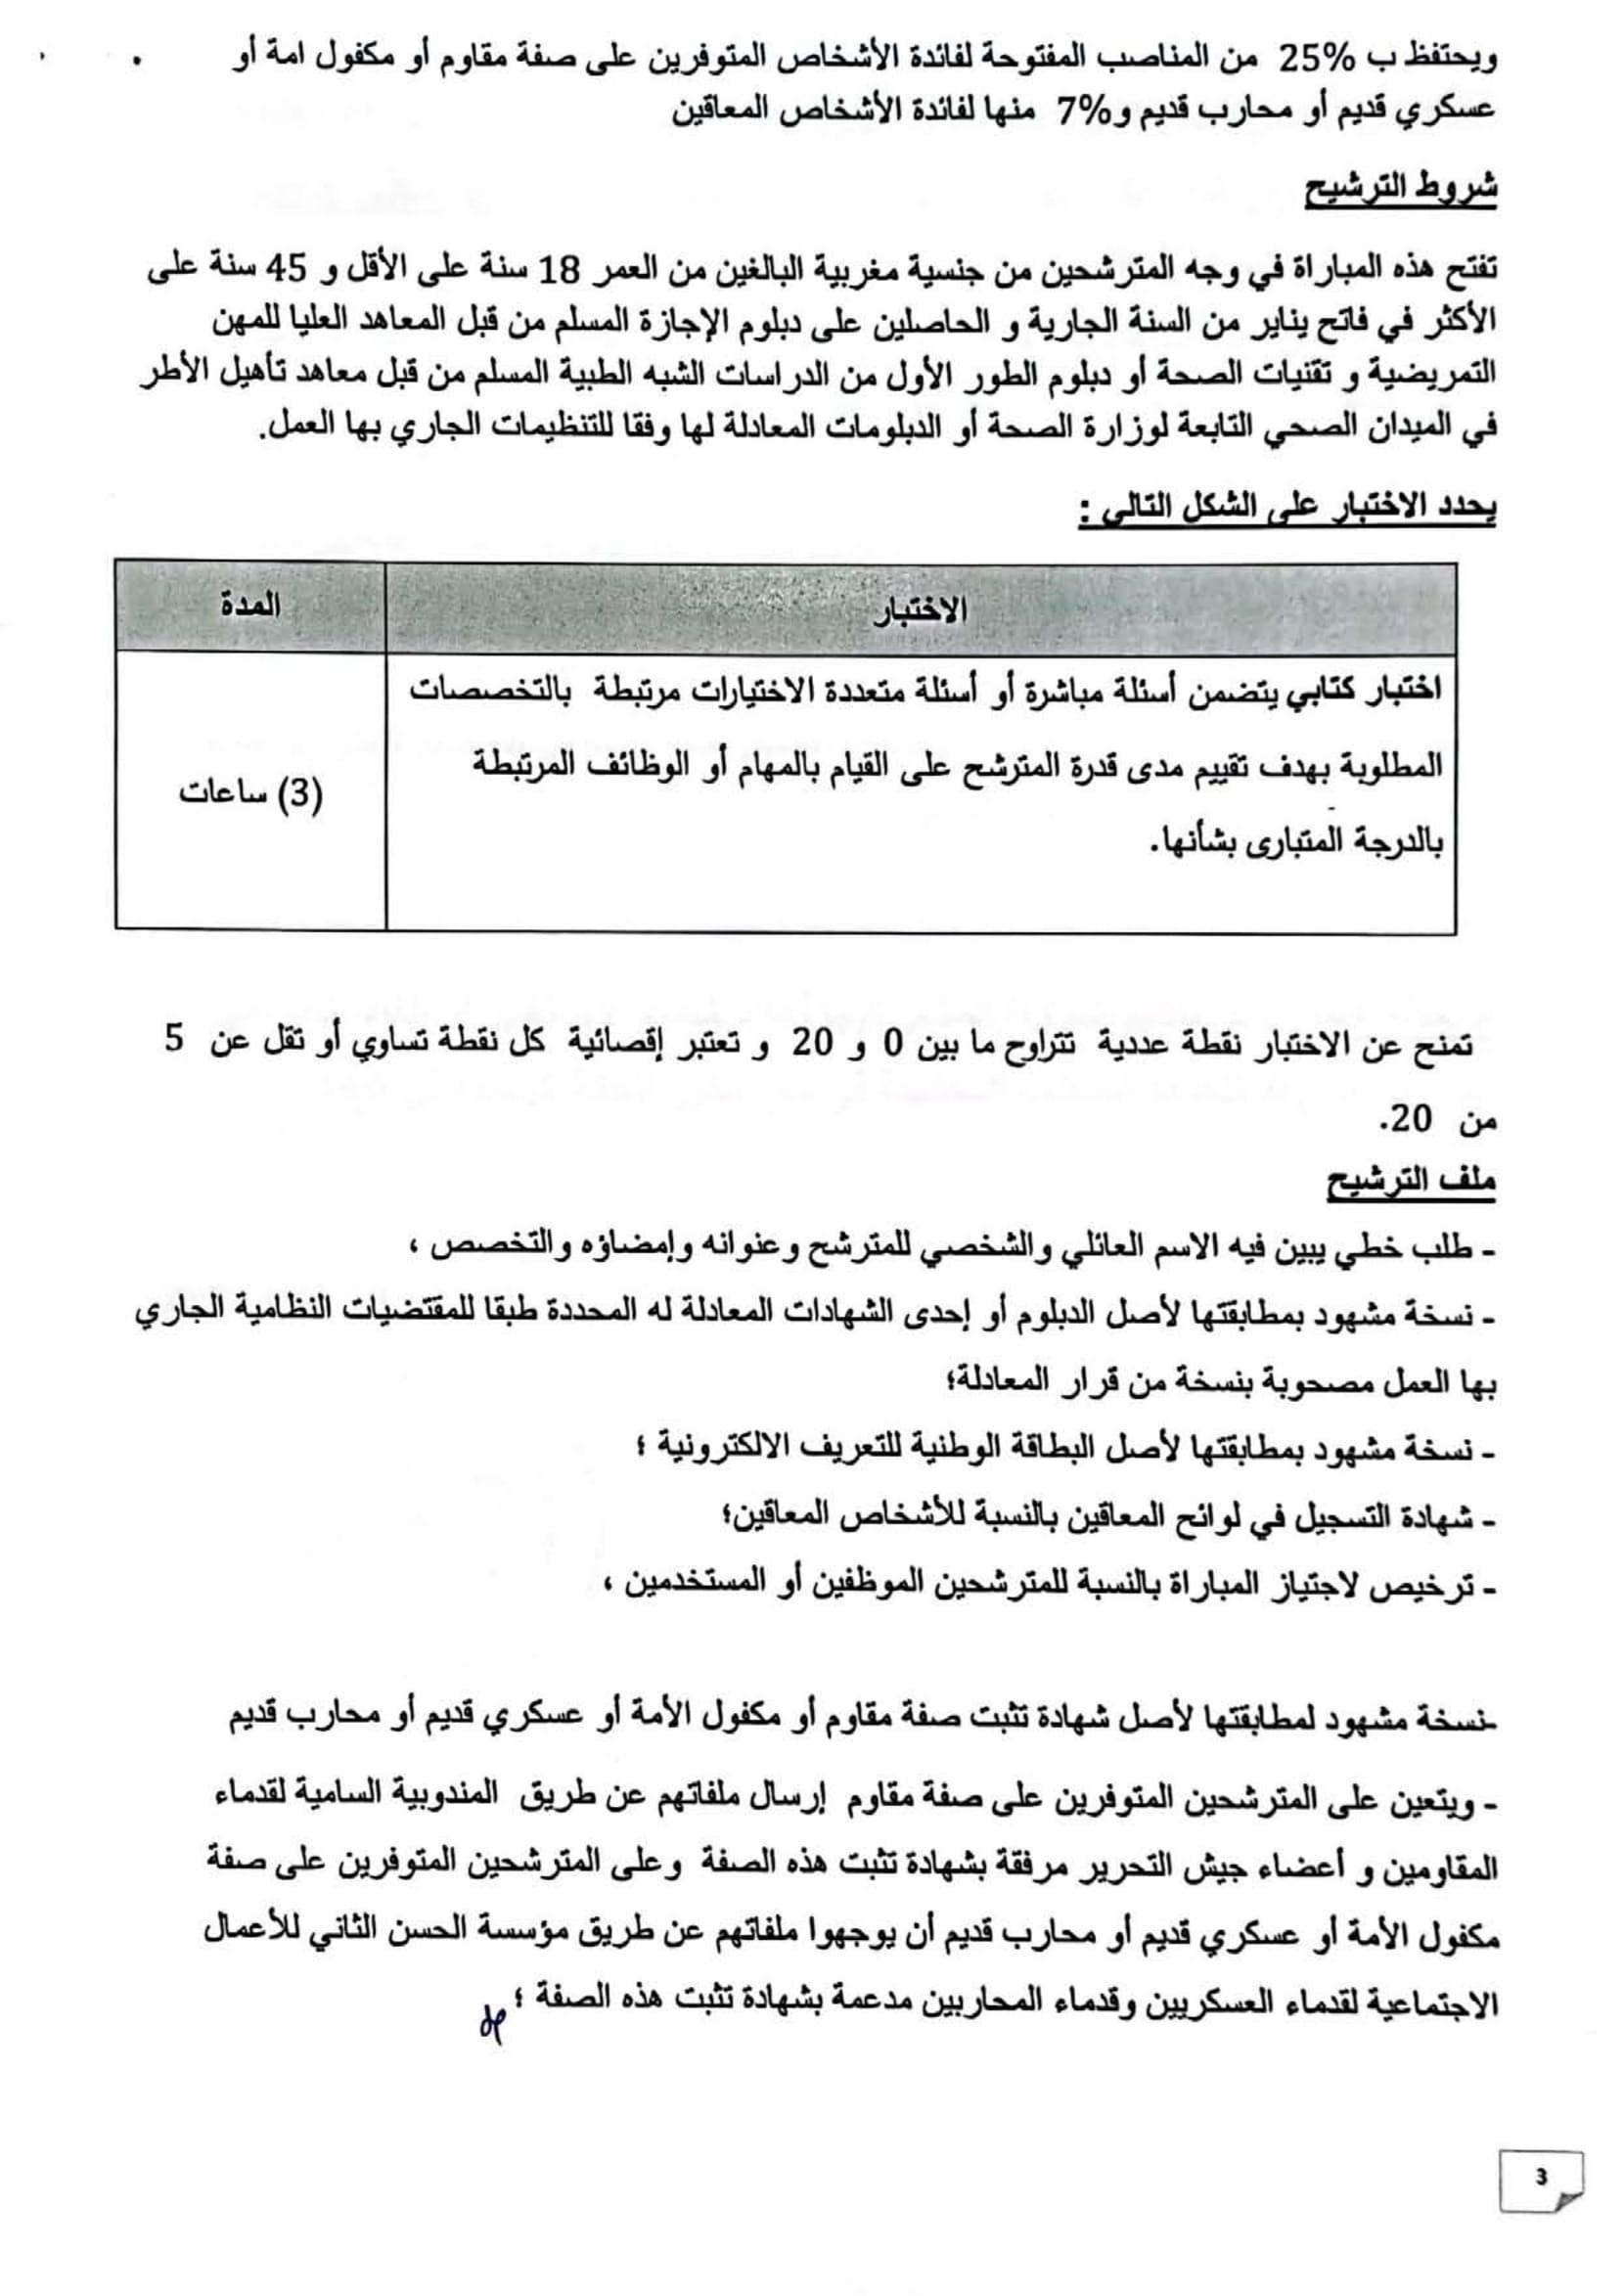 DRHFC0496 3 Concours de Recrutement CHU Hassan II 2021 (88 Postes)